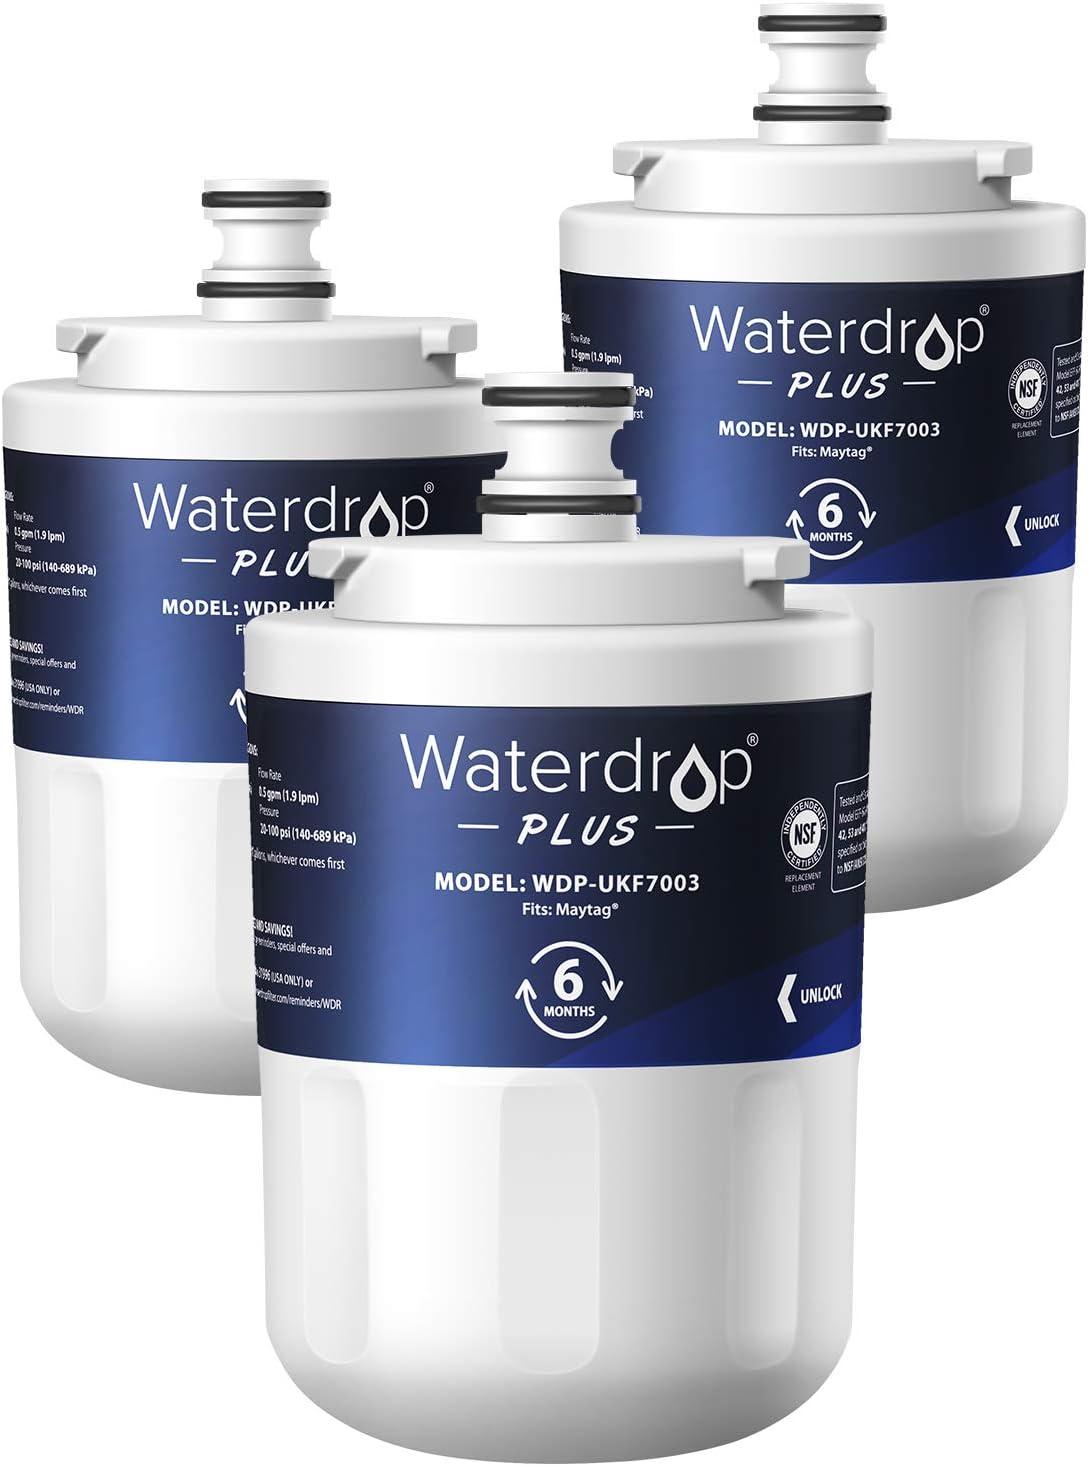 Waterdrop UKF7003 Refrigerator Water Filter, Replacement for Maytag UKF7003, UKF7002AXX, Whirlpool EDR7D1, UKF7003AXX, UKF7002, 7003AXXP, UKF7001AXX, UKF6001AXX, UKF5001, NSF 401&53 Certified, 3 Pack